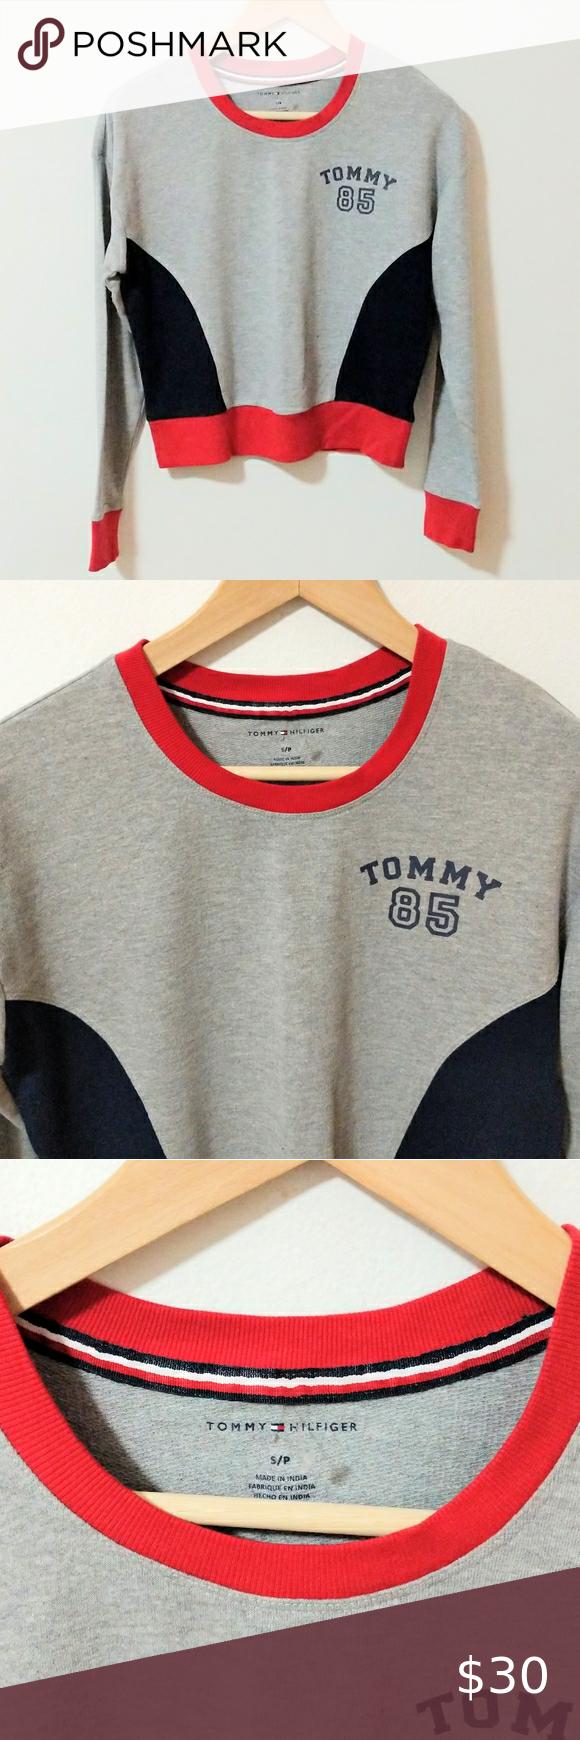 Tommy Hilfiger Sweatshirt Cropped Crewneck Logo Tommy Hilfiger Cropped Crewneck Pullover Sweatshirt Good P Sweatshirts Tommy Hilfiger Sweatshirt Tommy Hilfiger [ 1740 x 580 Pixel ]